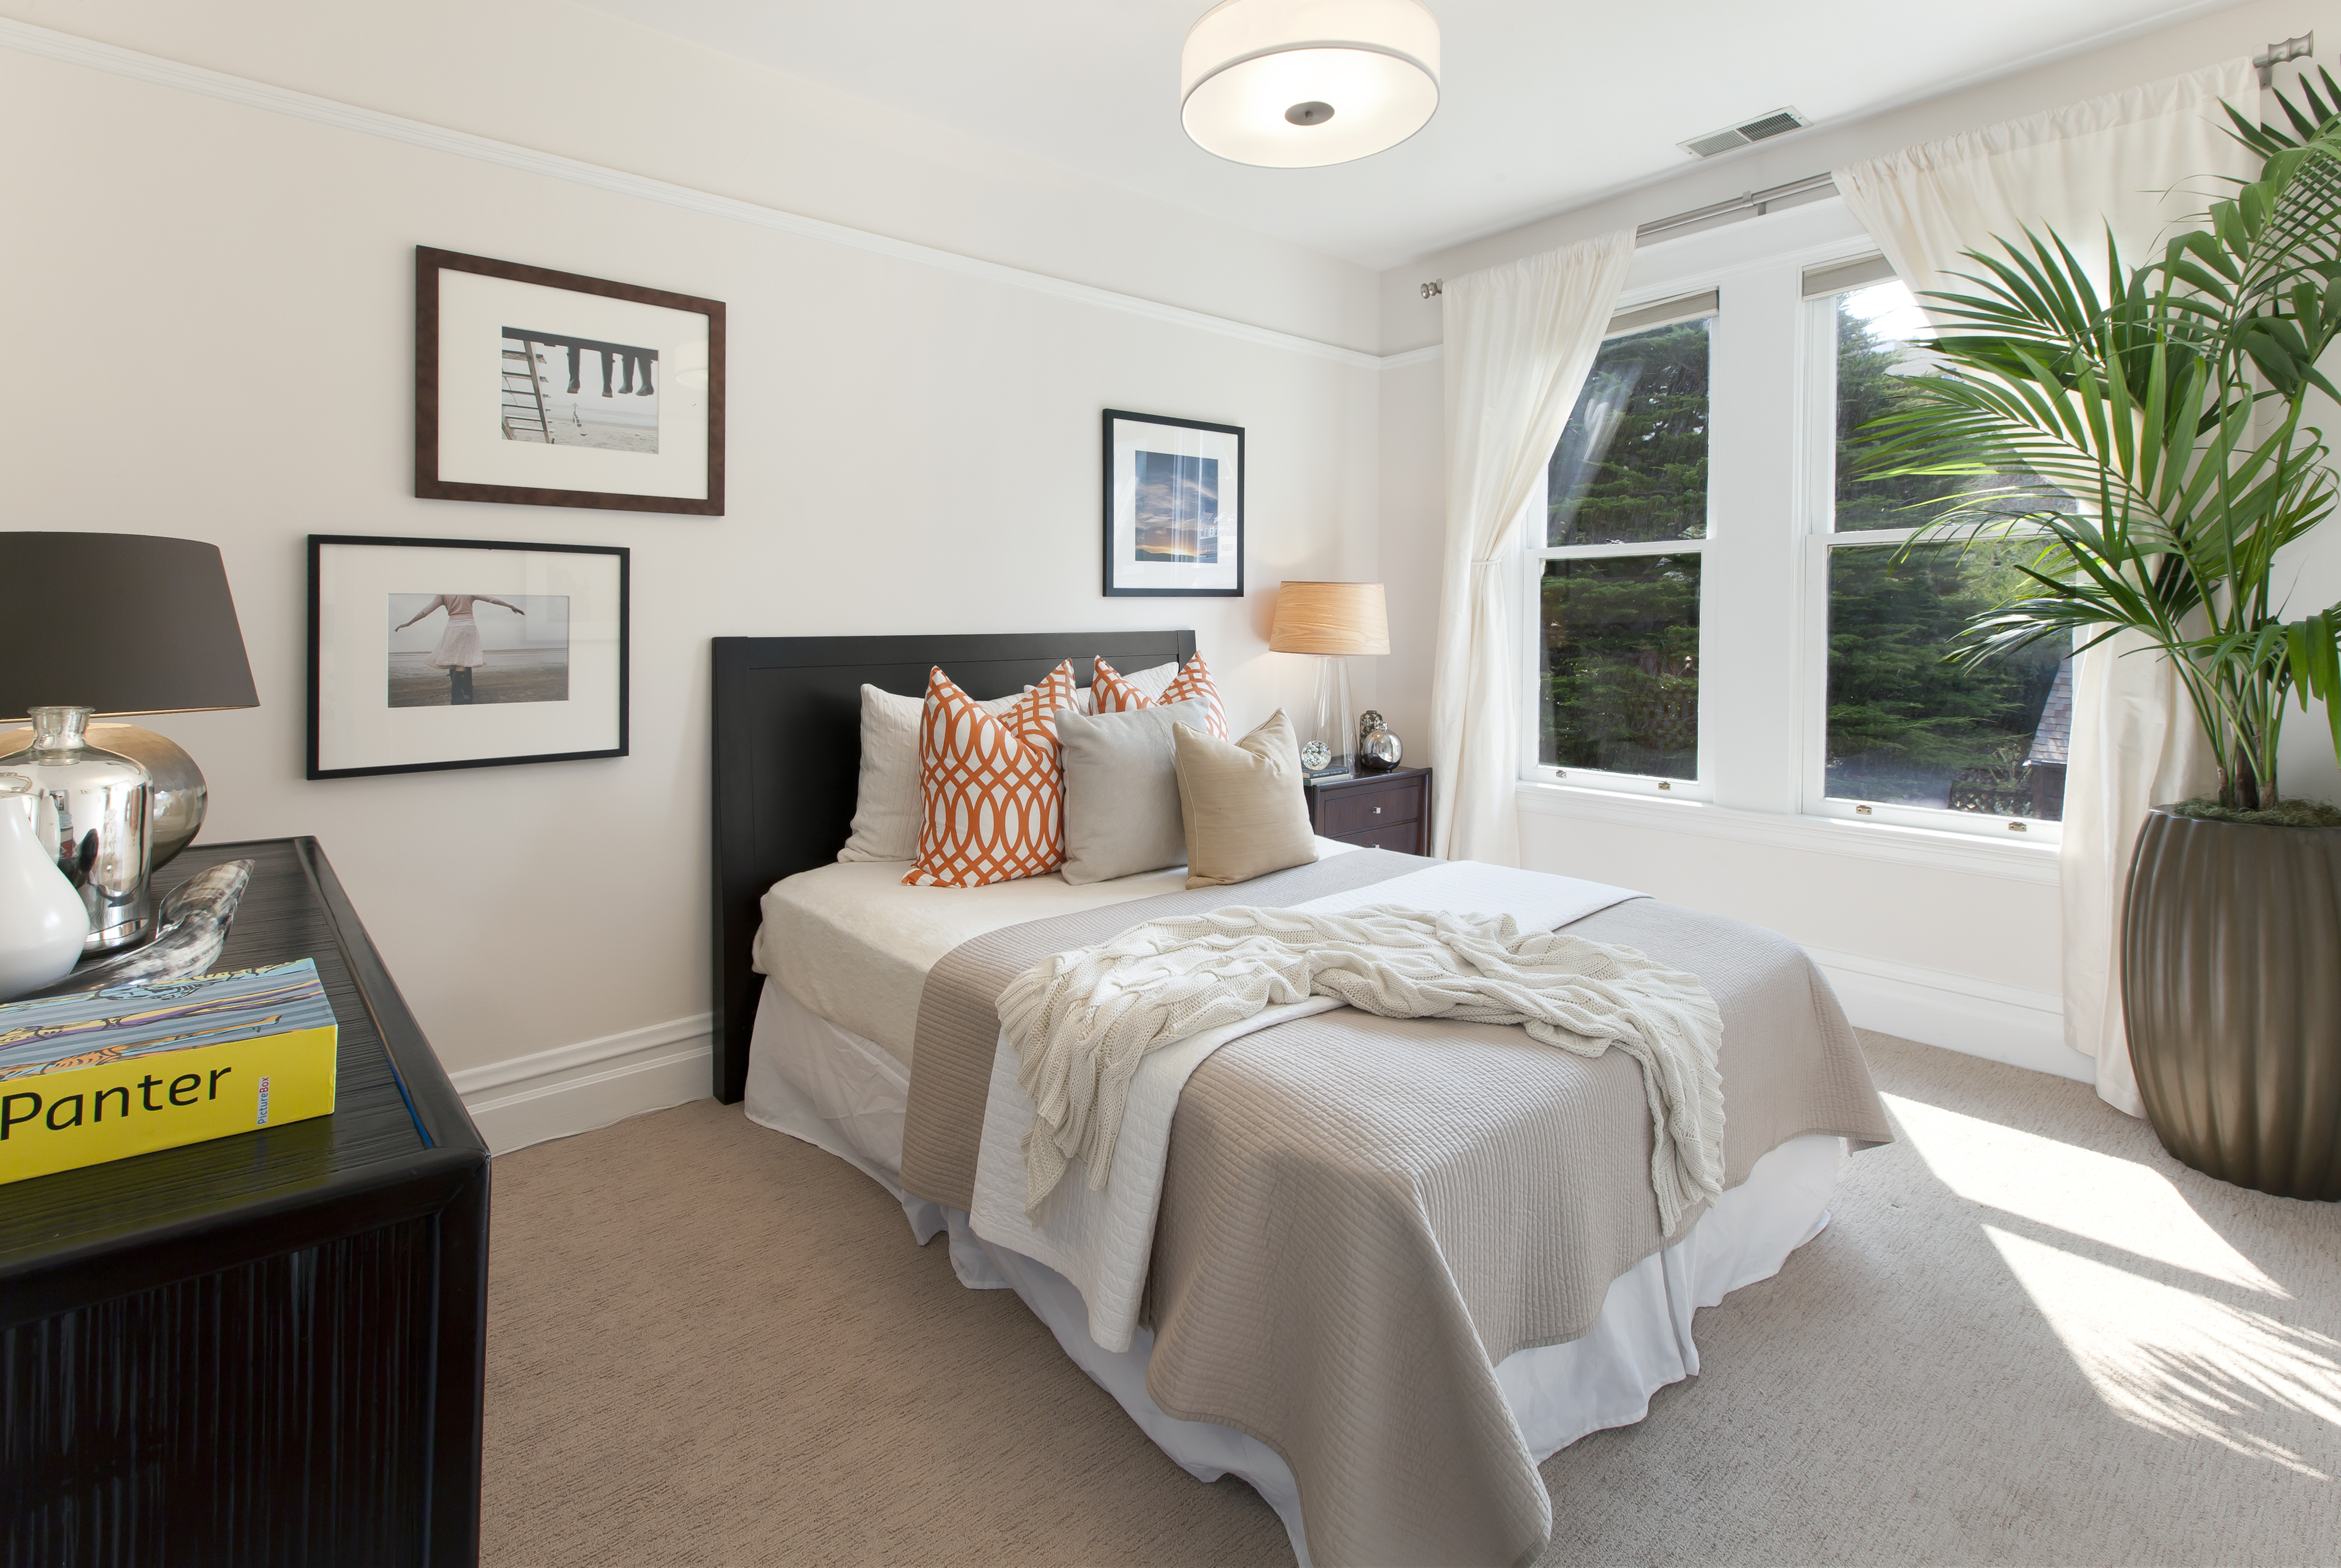 For Sale  29 Rivoli  Top Floor Edwardian View Condo In